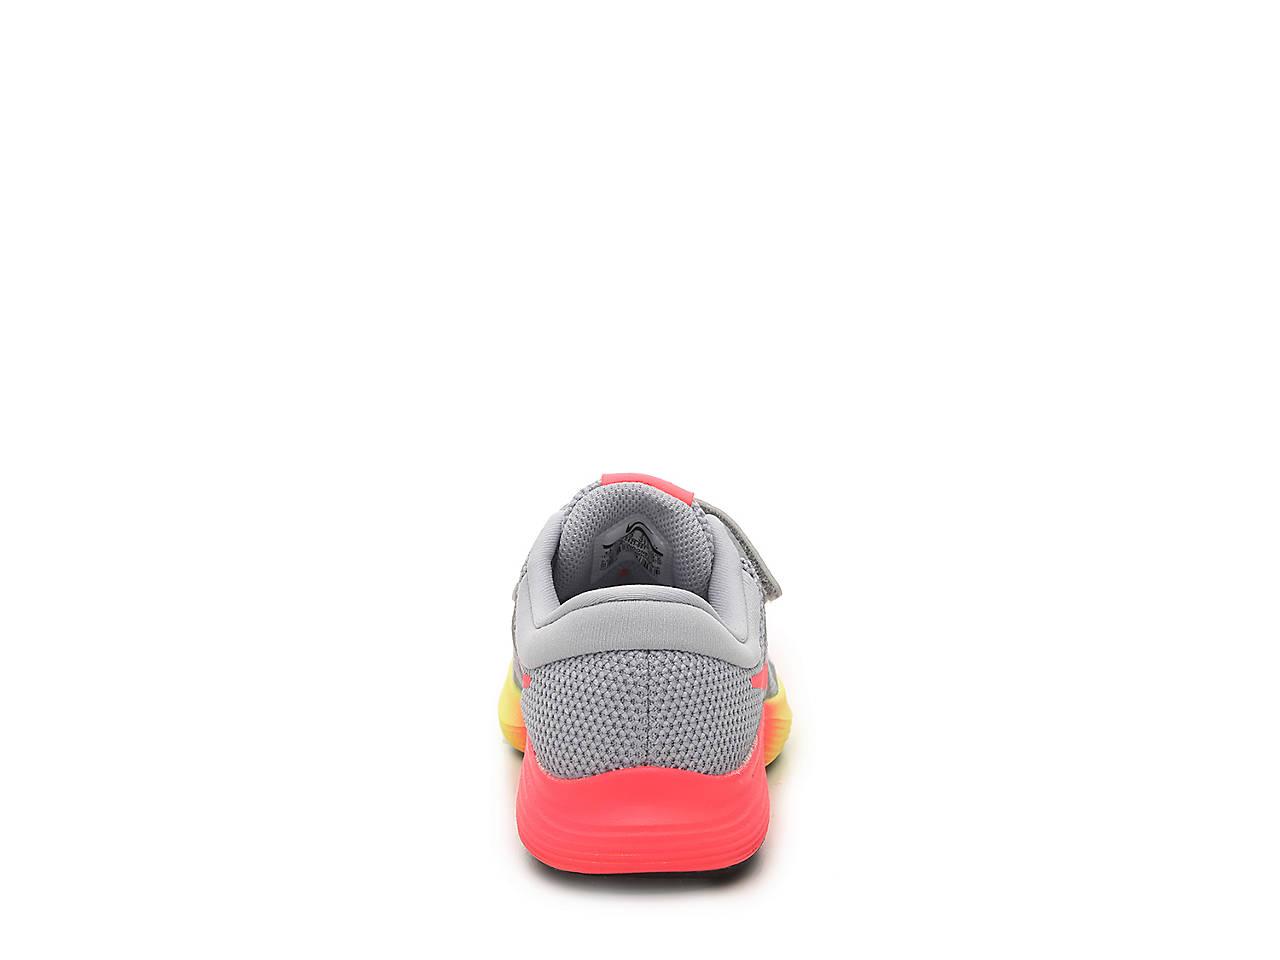 1d80168da4450 Nike Revolution 4 Fade Toddler   Youth Sneaker Kids Shoes